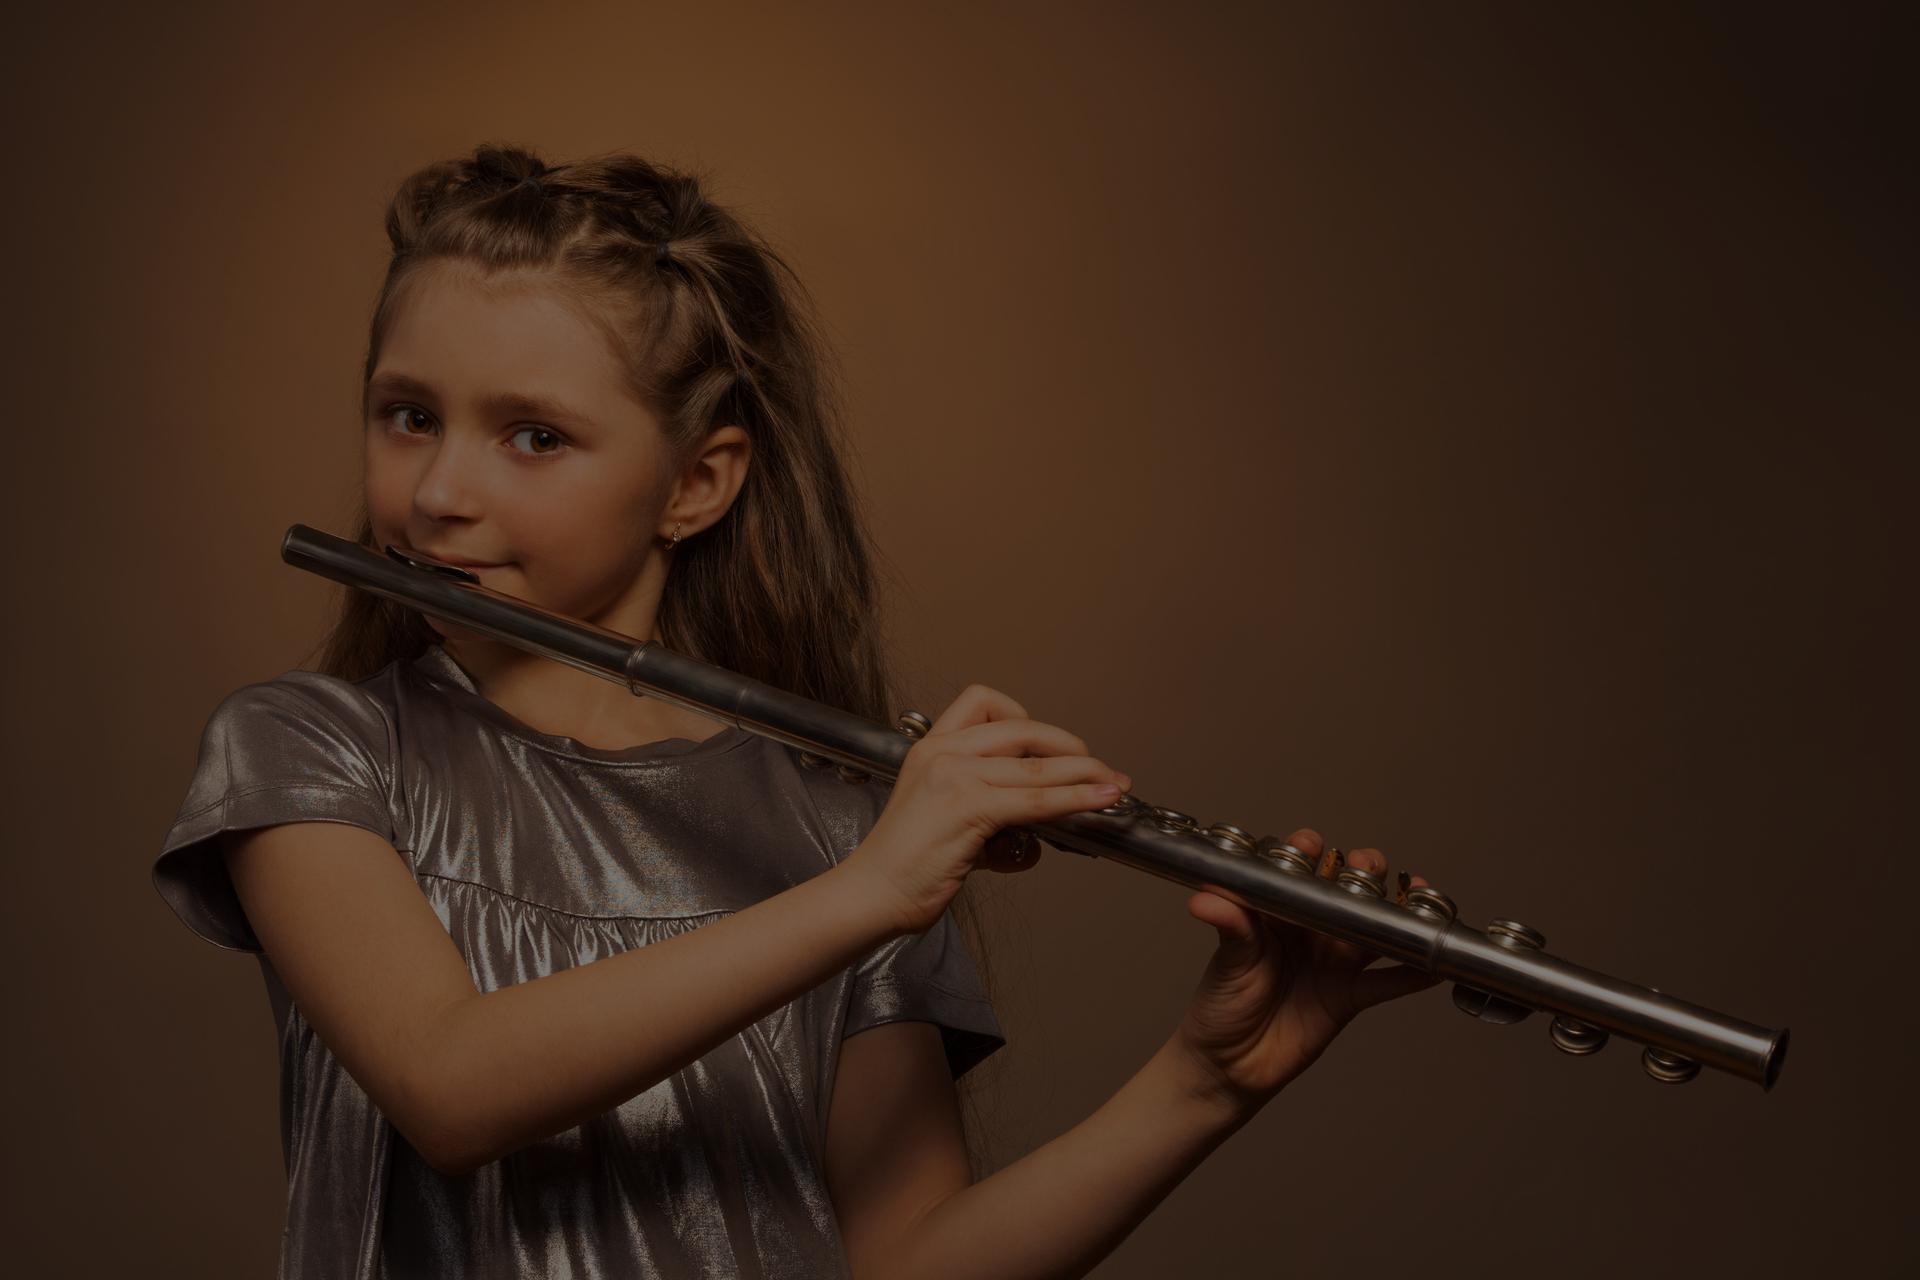 lekcje gry na flecie nauka gry na flecie